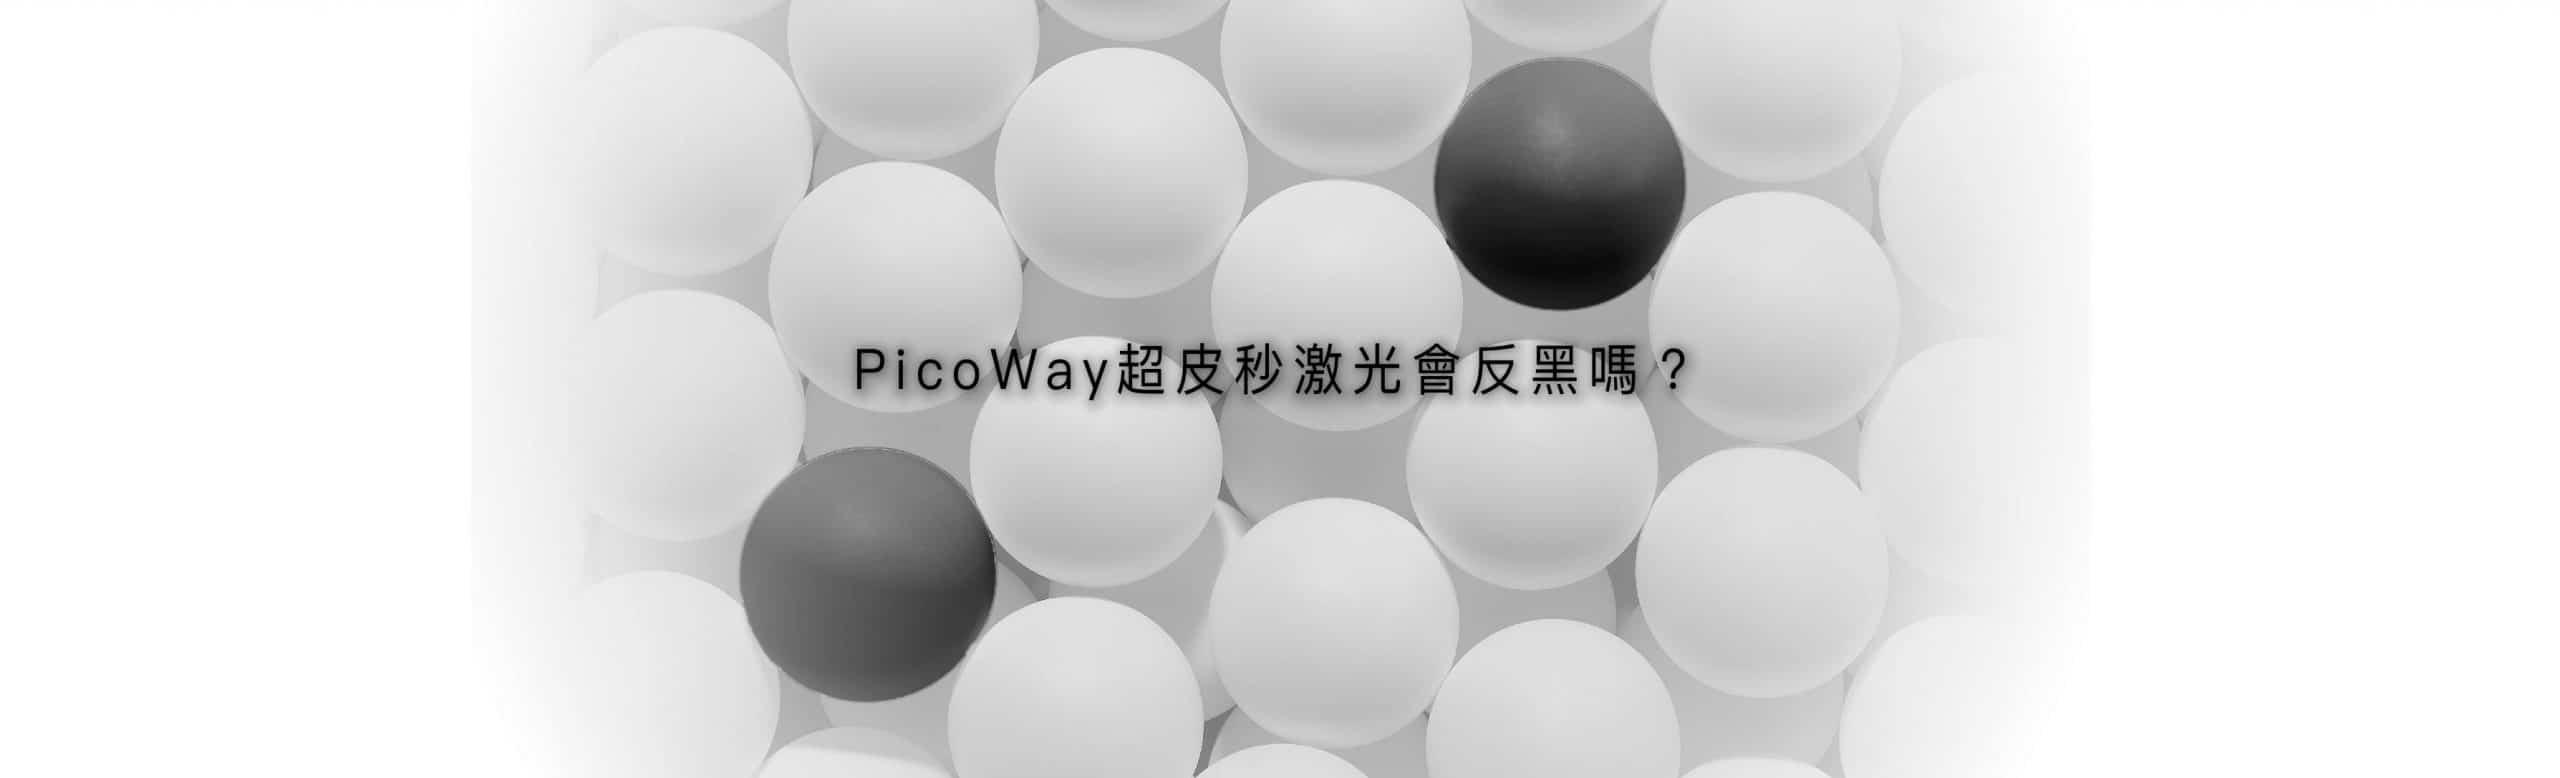 Picoway Picoway ptop3 34 1 scaled